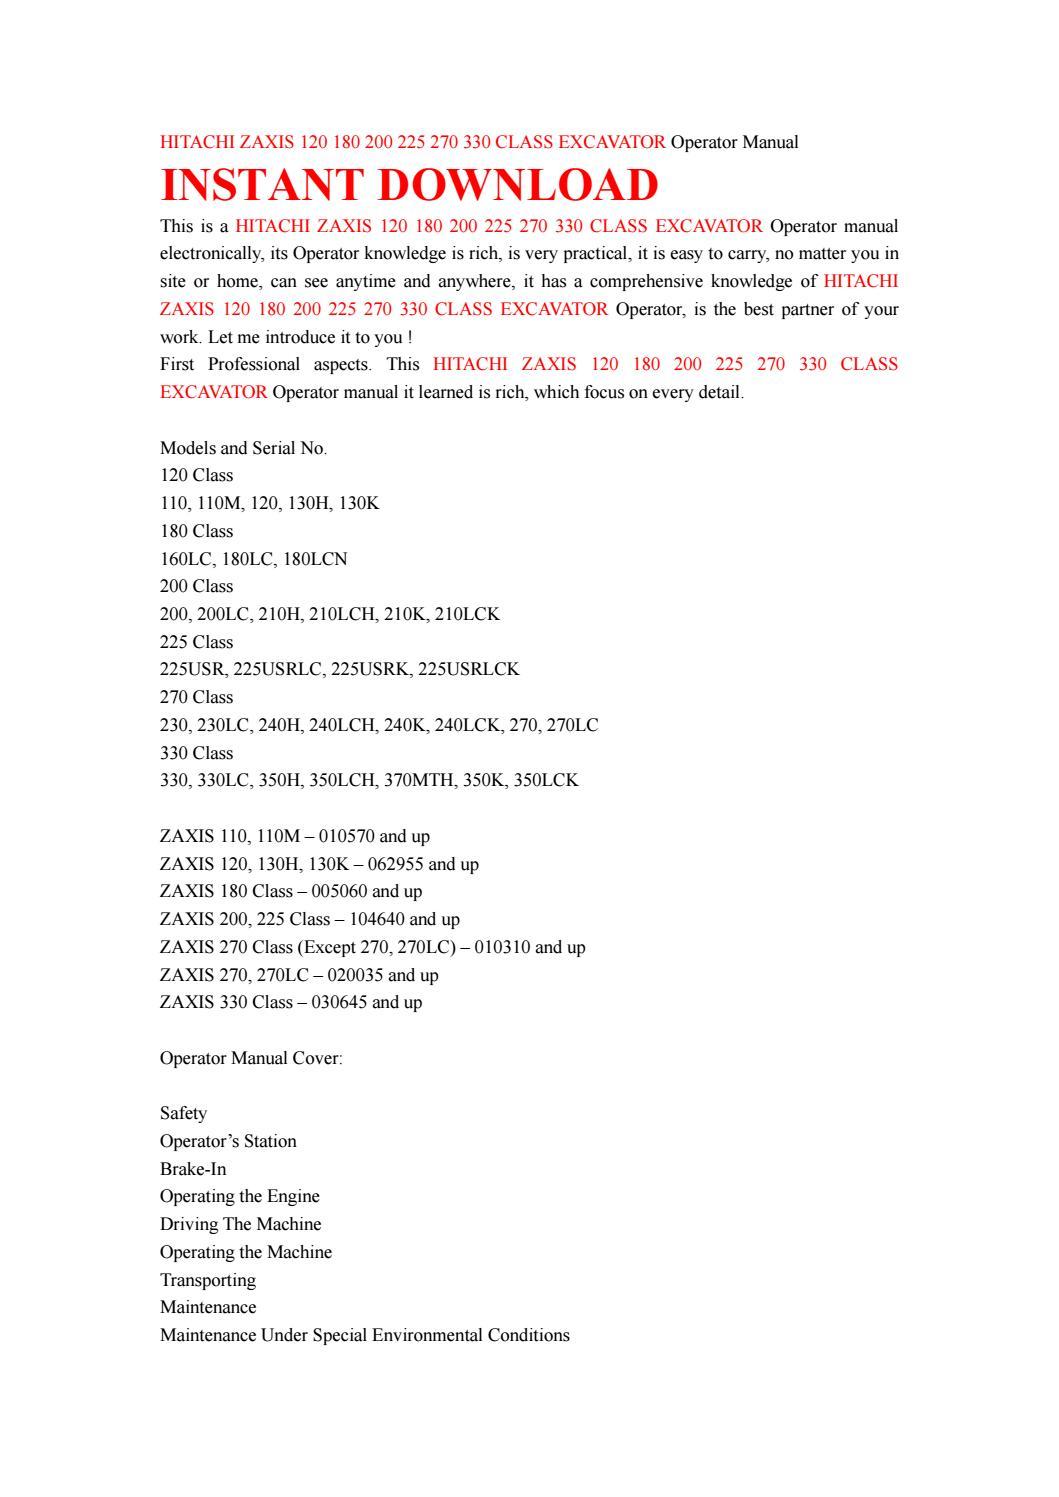 Hitachi zaxis 120 180 200 225 270 330 class excavator operator manual by  ksjefhsnef - issuu